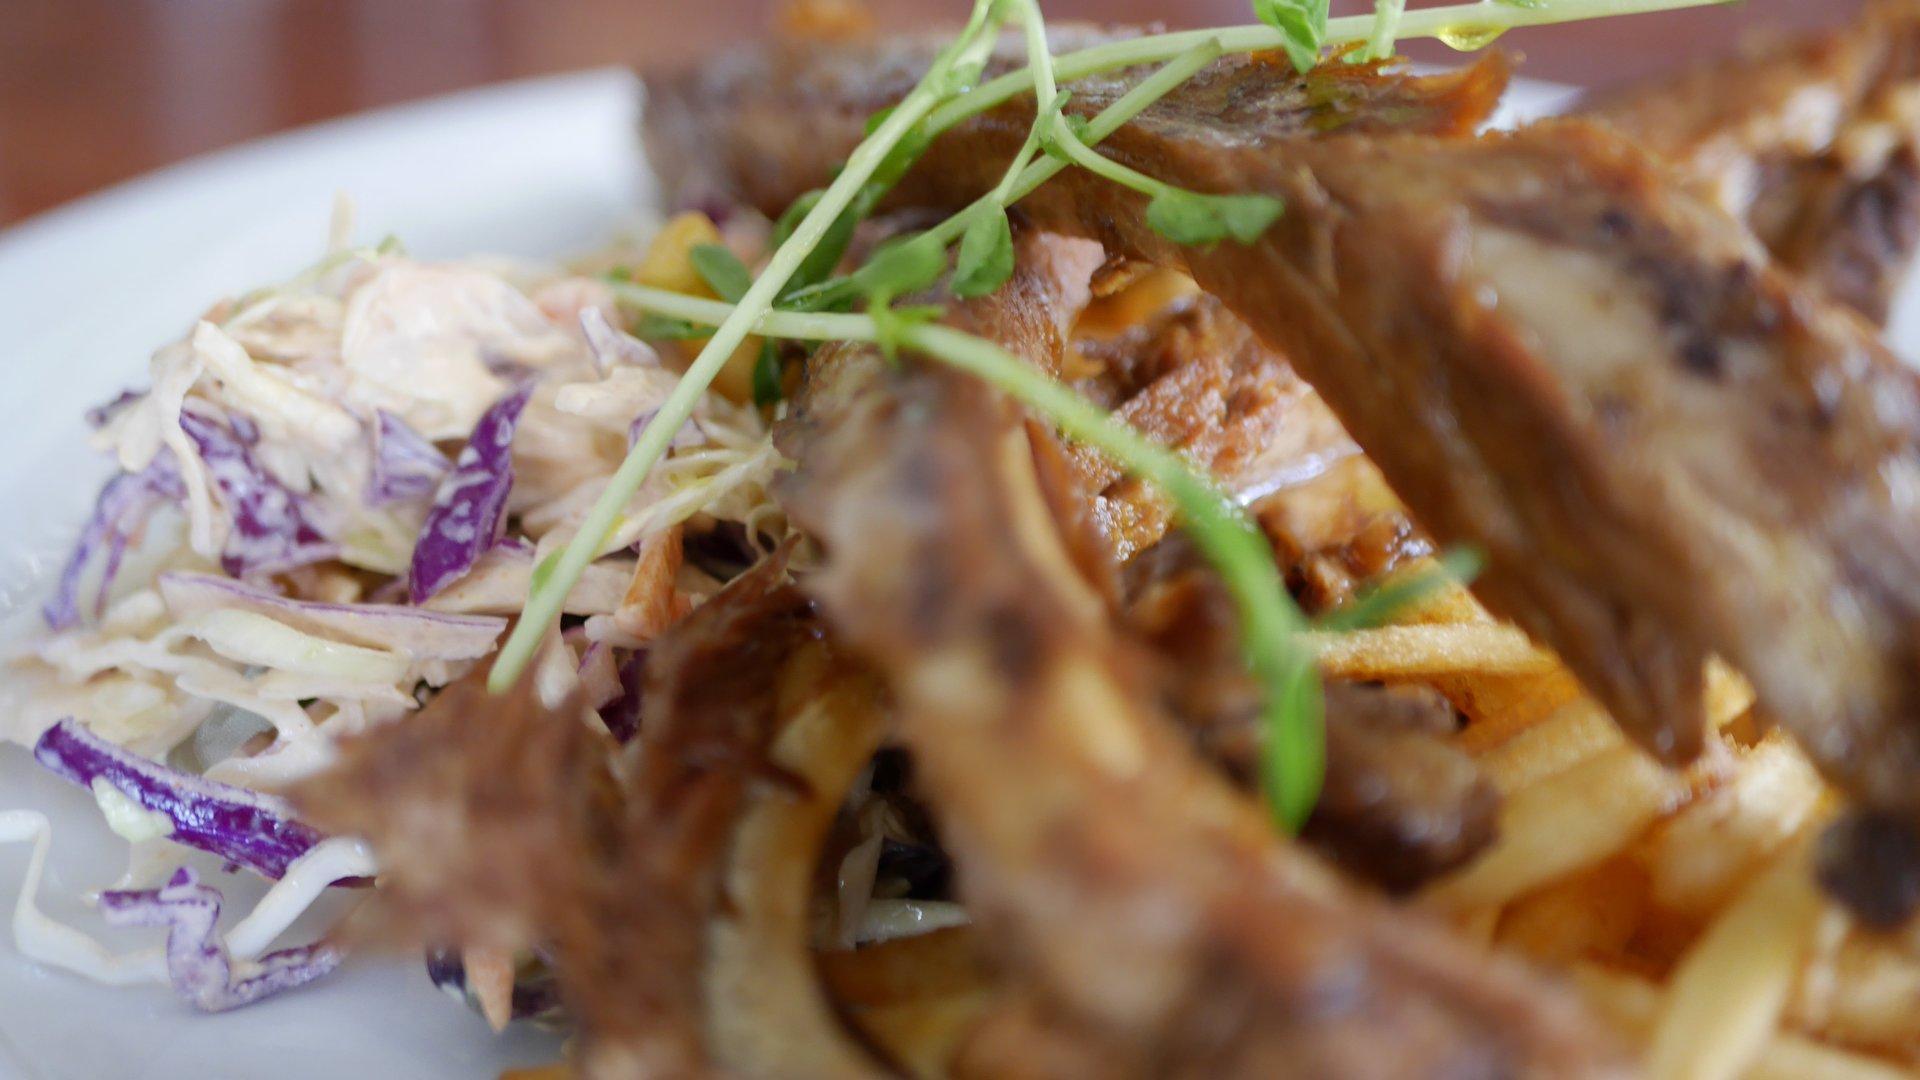 Japanese Yakitori - Marinated Pork Ribs with Slaw and Fries.